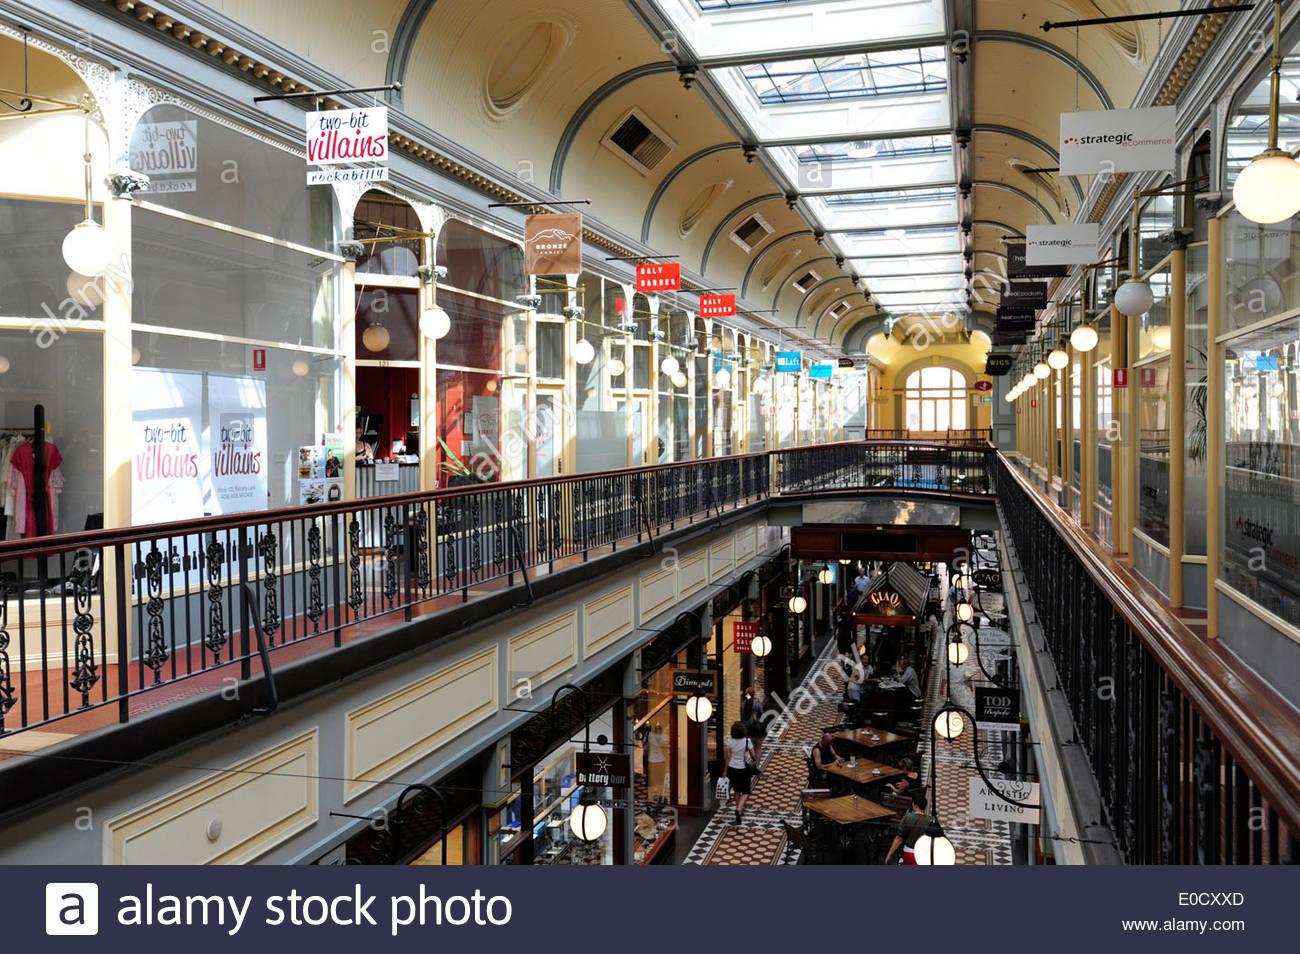 Adelaide Arcade, shopping arcade at Rundle Mall in the city centre, Adelaide, South Australia, SA, Australia - Stock Image